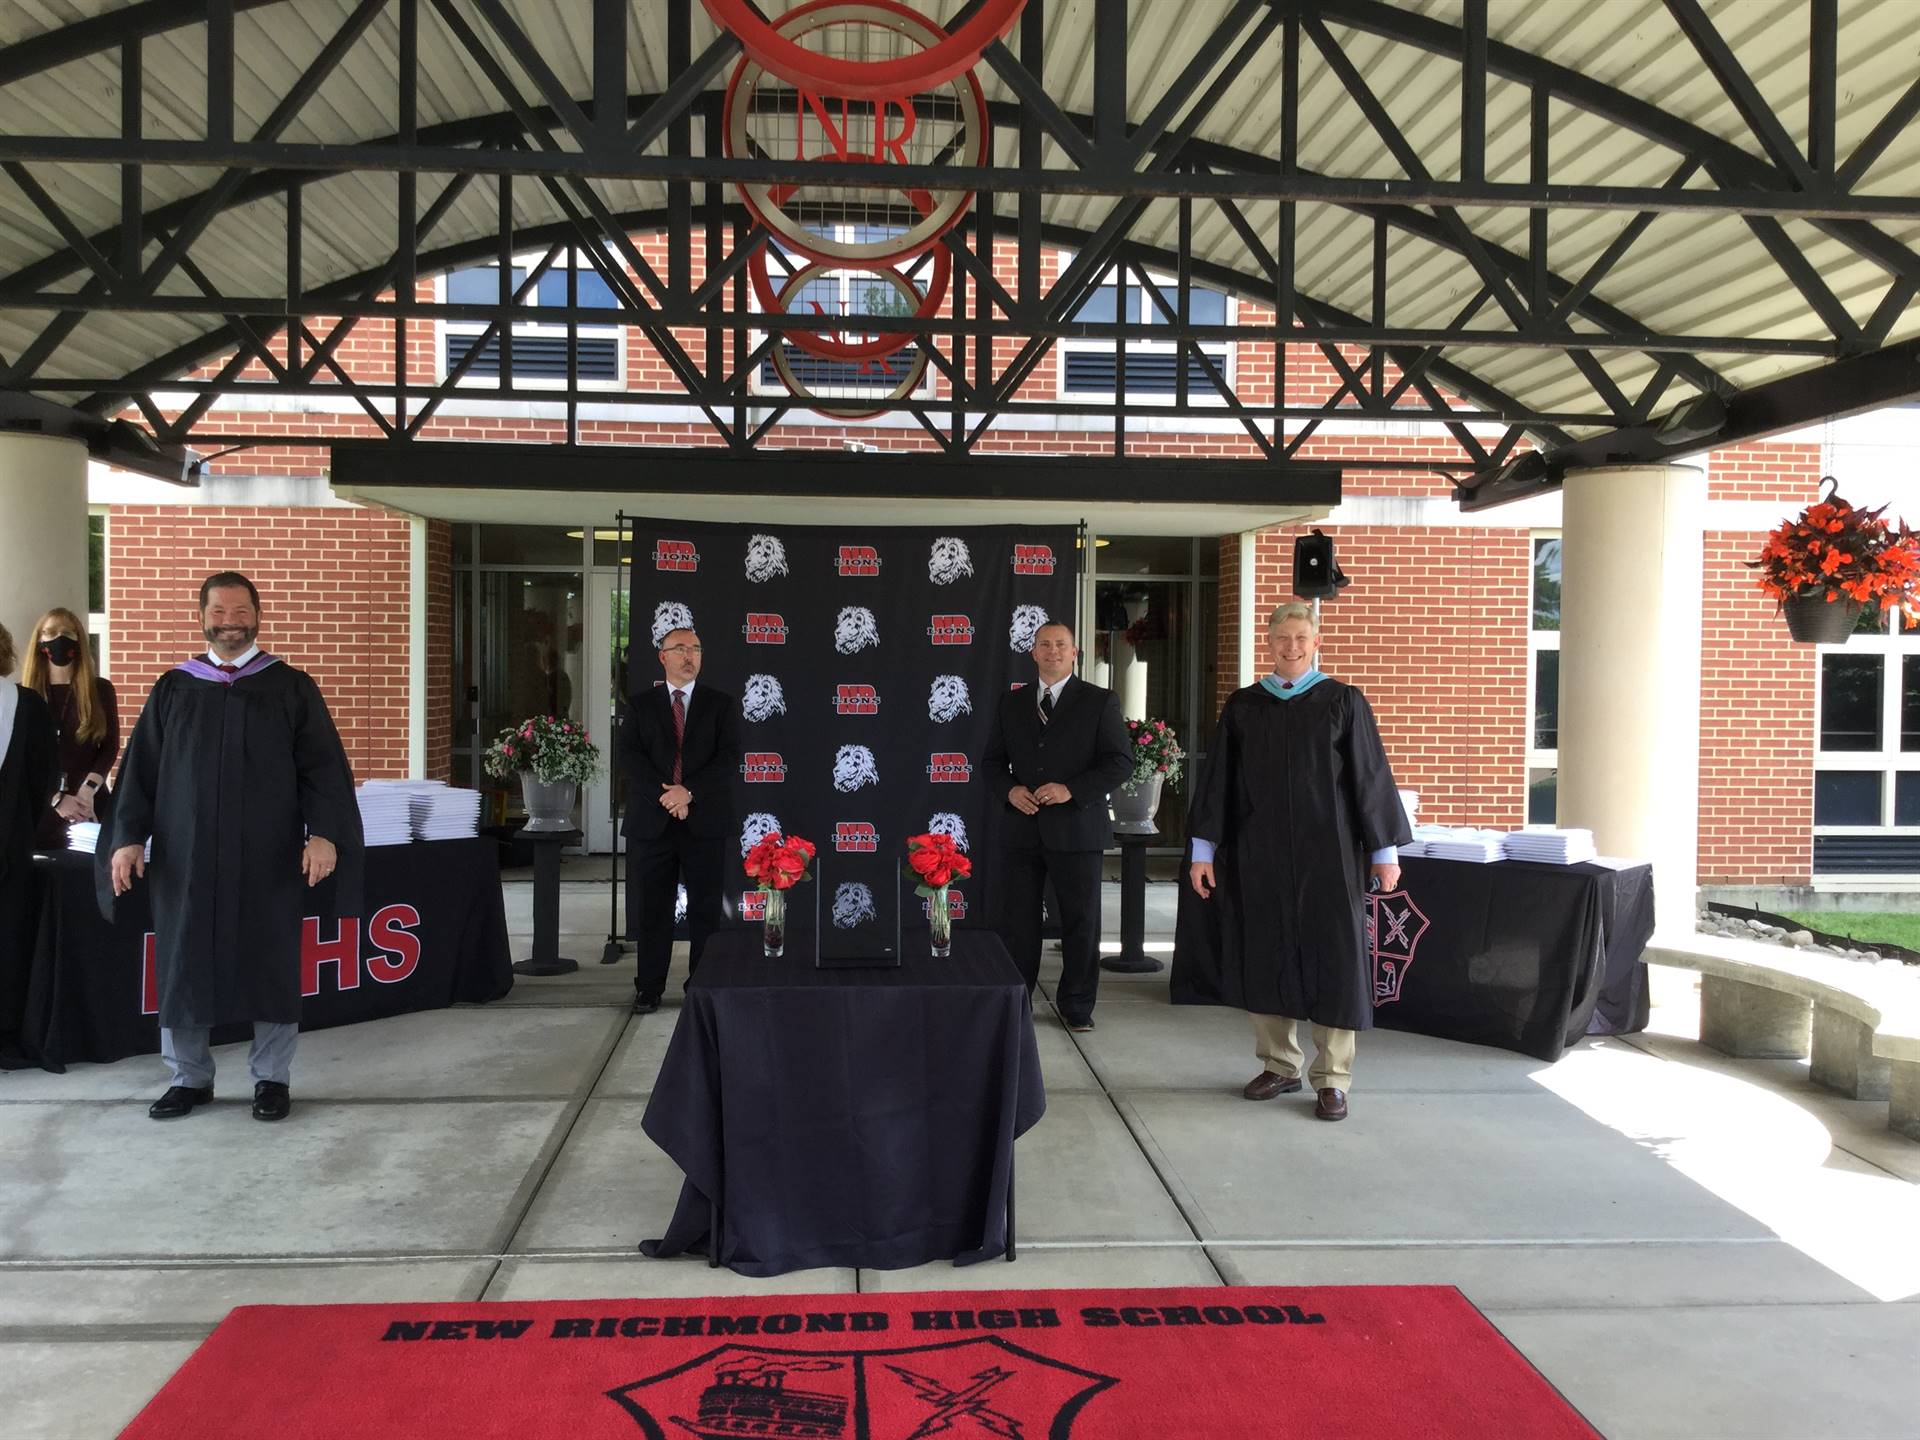 Graduation diploma station